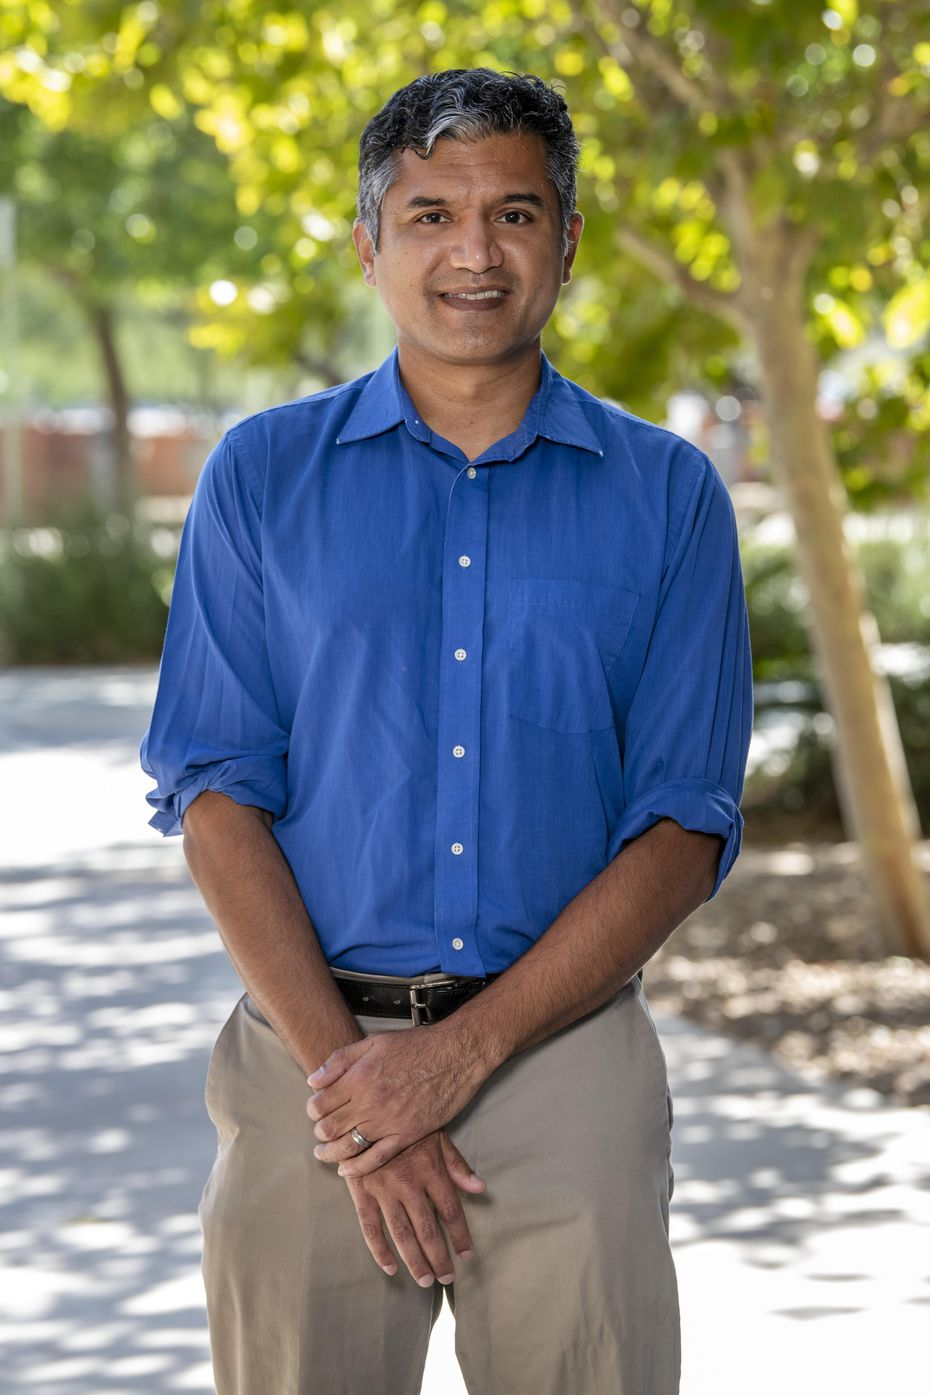 Deepta Bhattacharya, a professor of immunobiology at the University of Arizona College of Medicine.